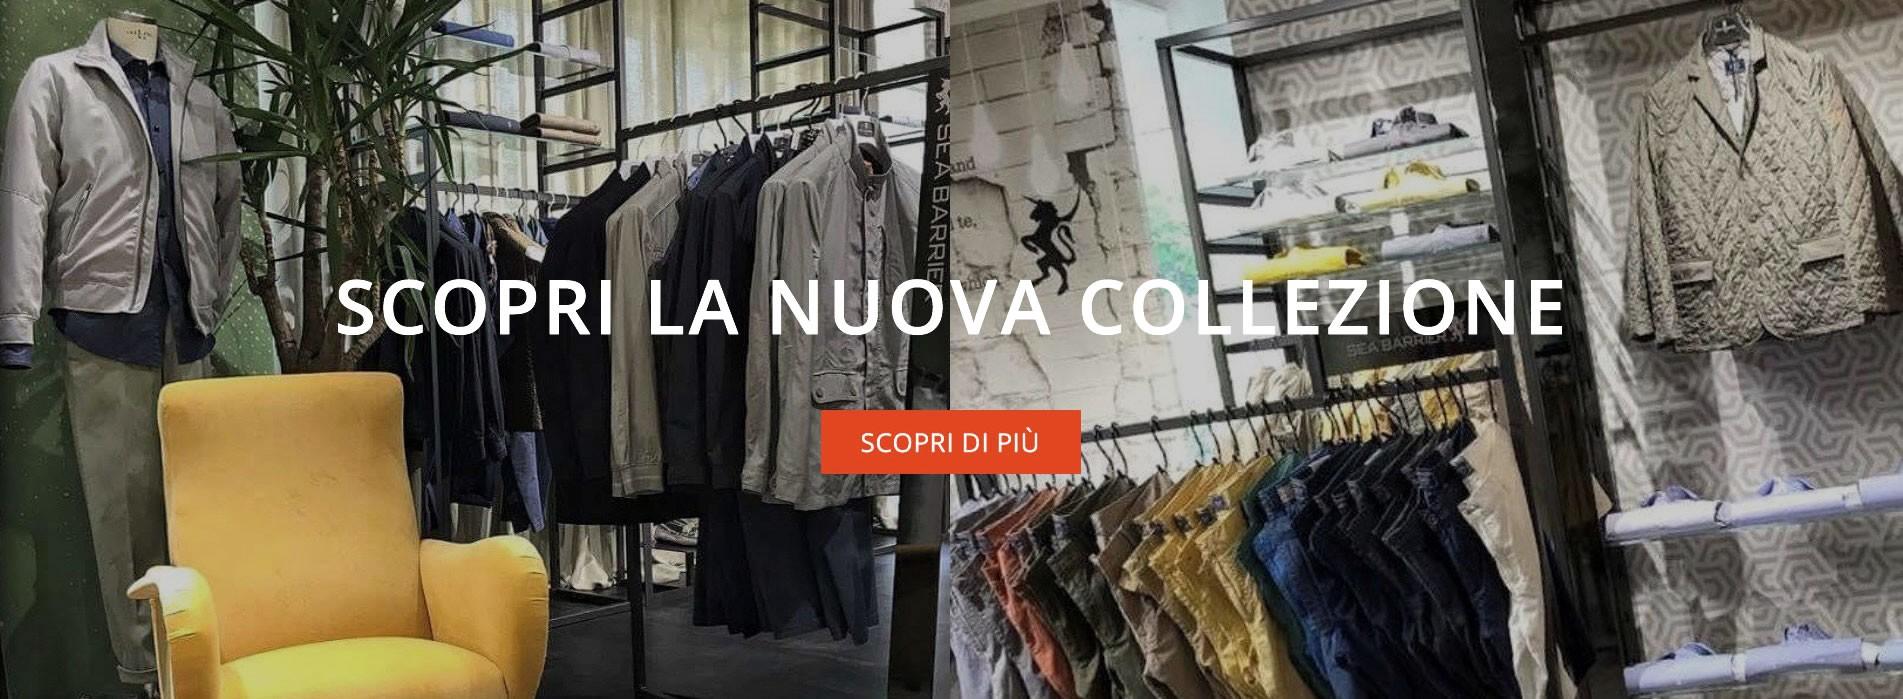 separation shoes c7a40 7c5fb MODA MERCATO STORE - Abbigliamento Uomo Modena - SHOP ONLINE